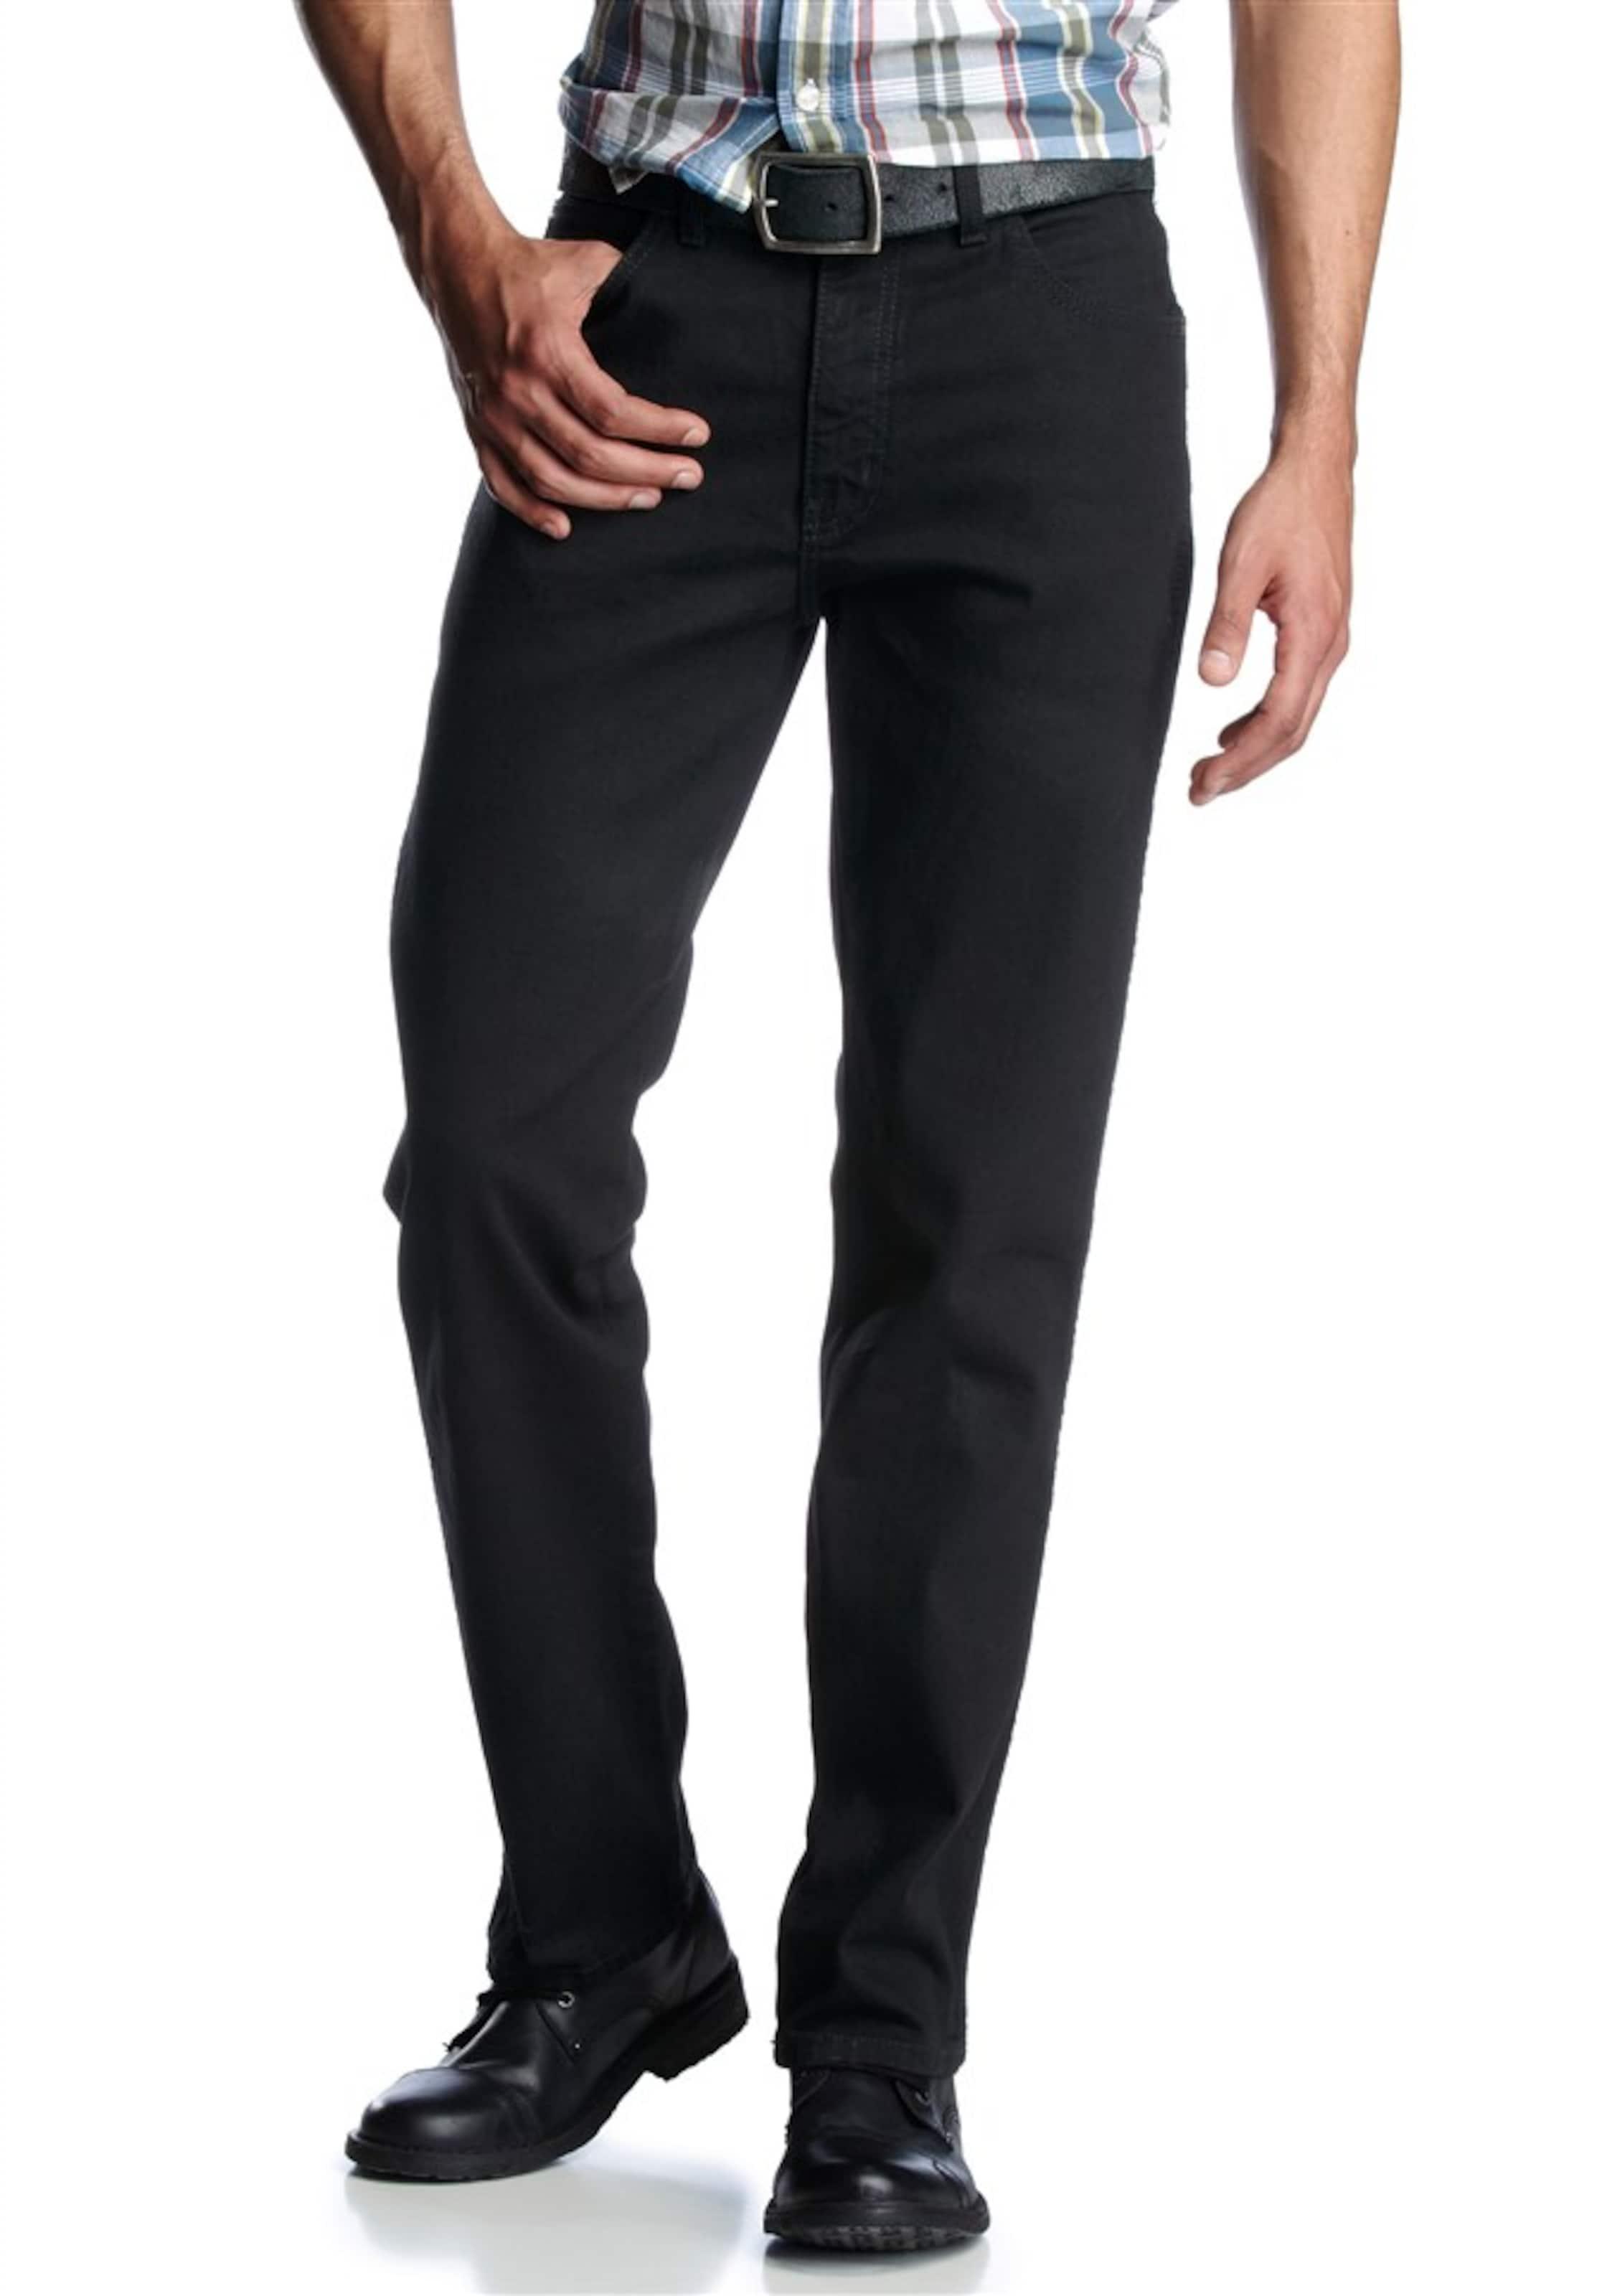 WRANGLER 5-Pocket-Jeans »Stretch« Manchester Günstige Austrittsstellen Di4dNCxYx